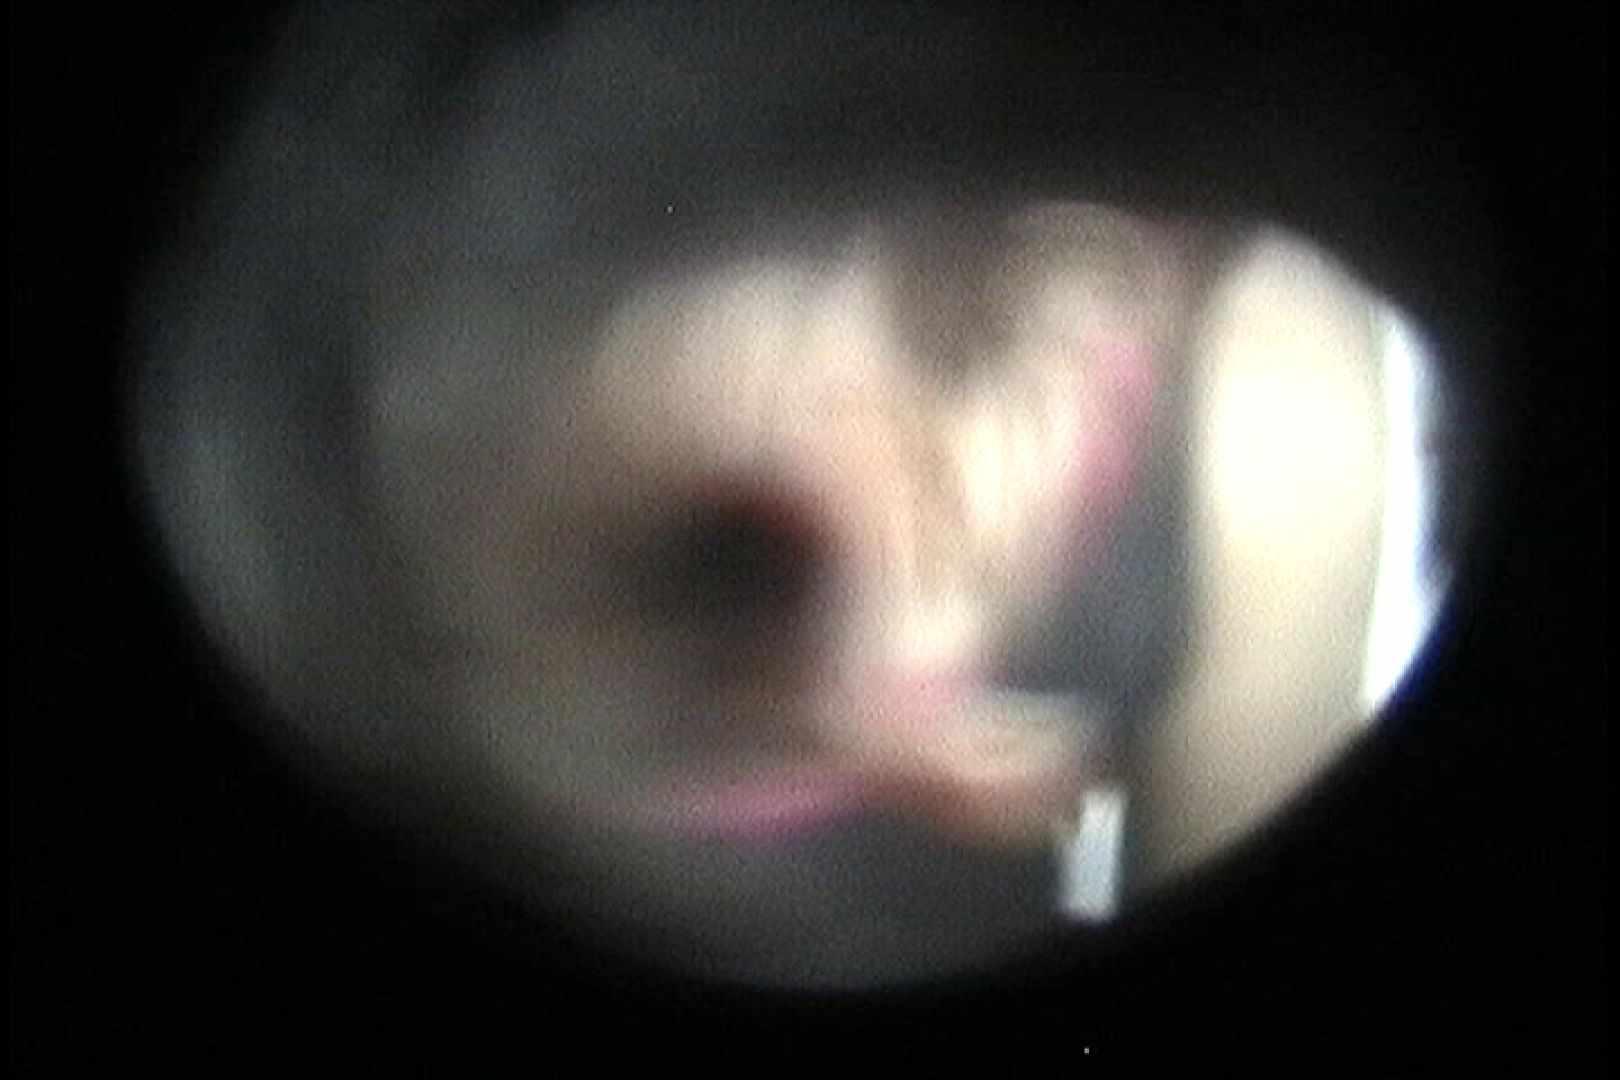 No.24 ビキニの割には陰毛は獰猛、ハミ毛が心配 接写 エロ画像 55連発 12